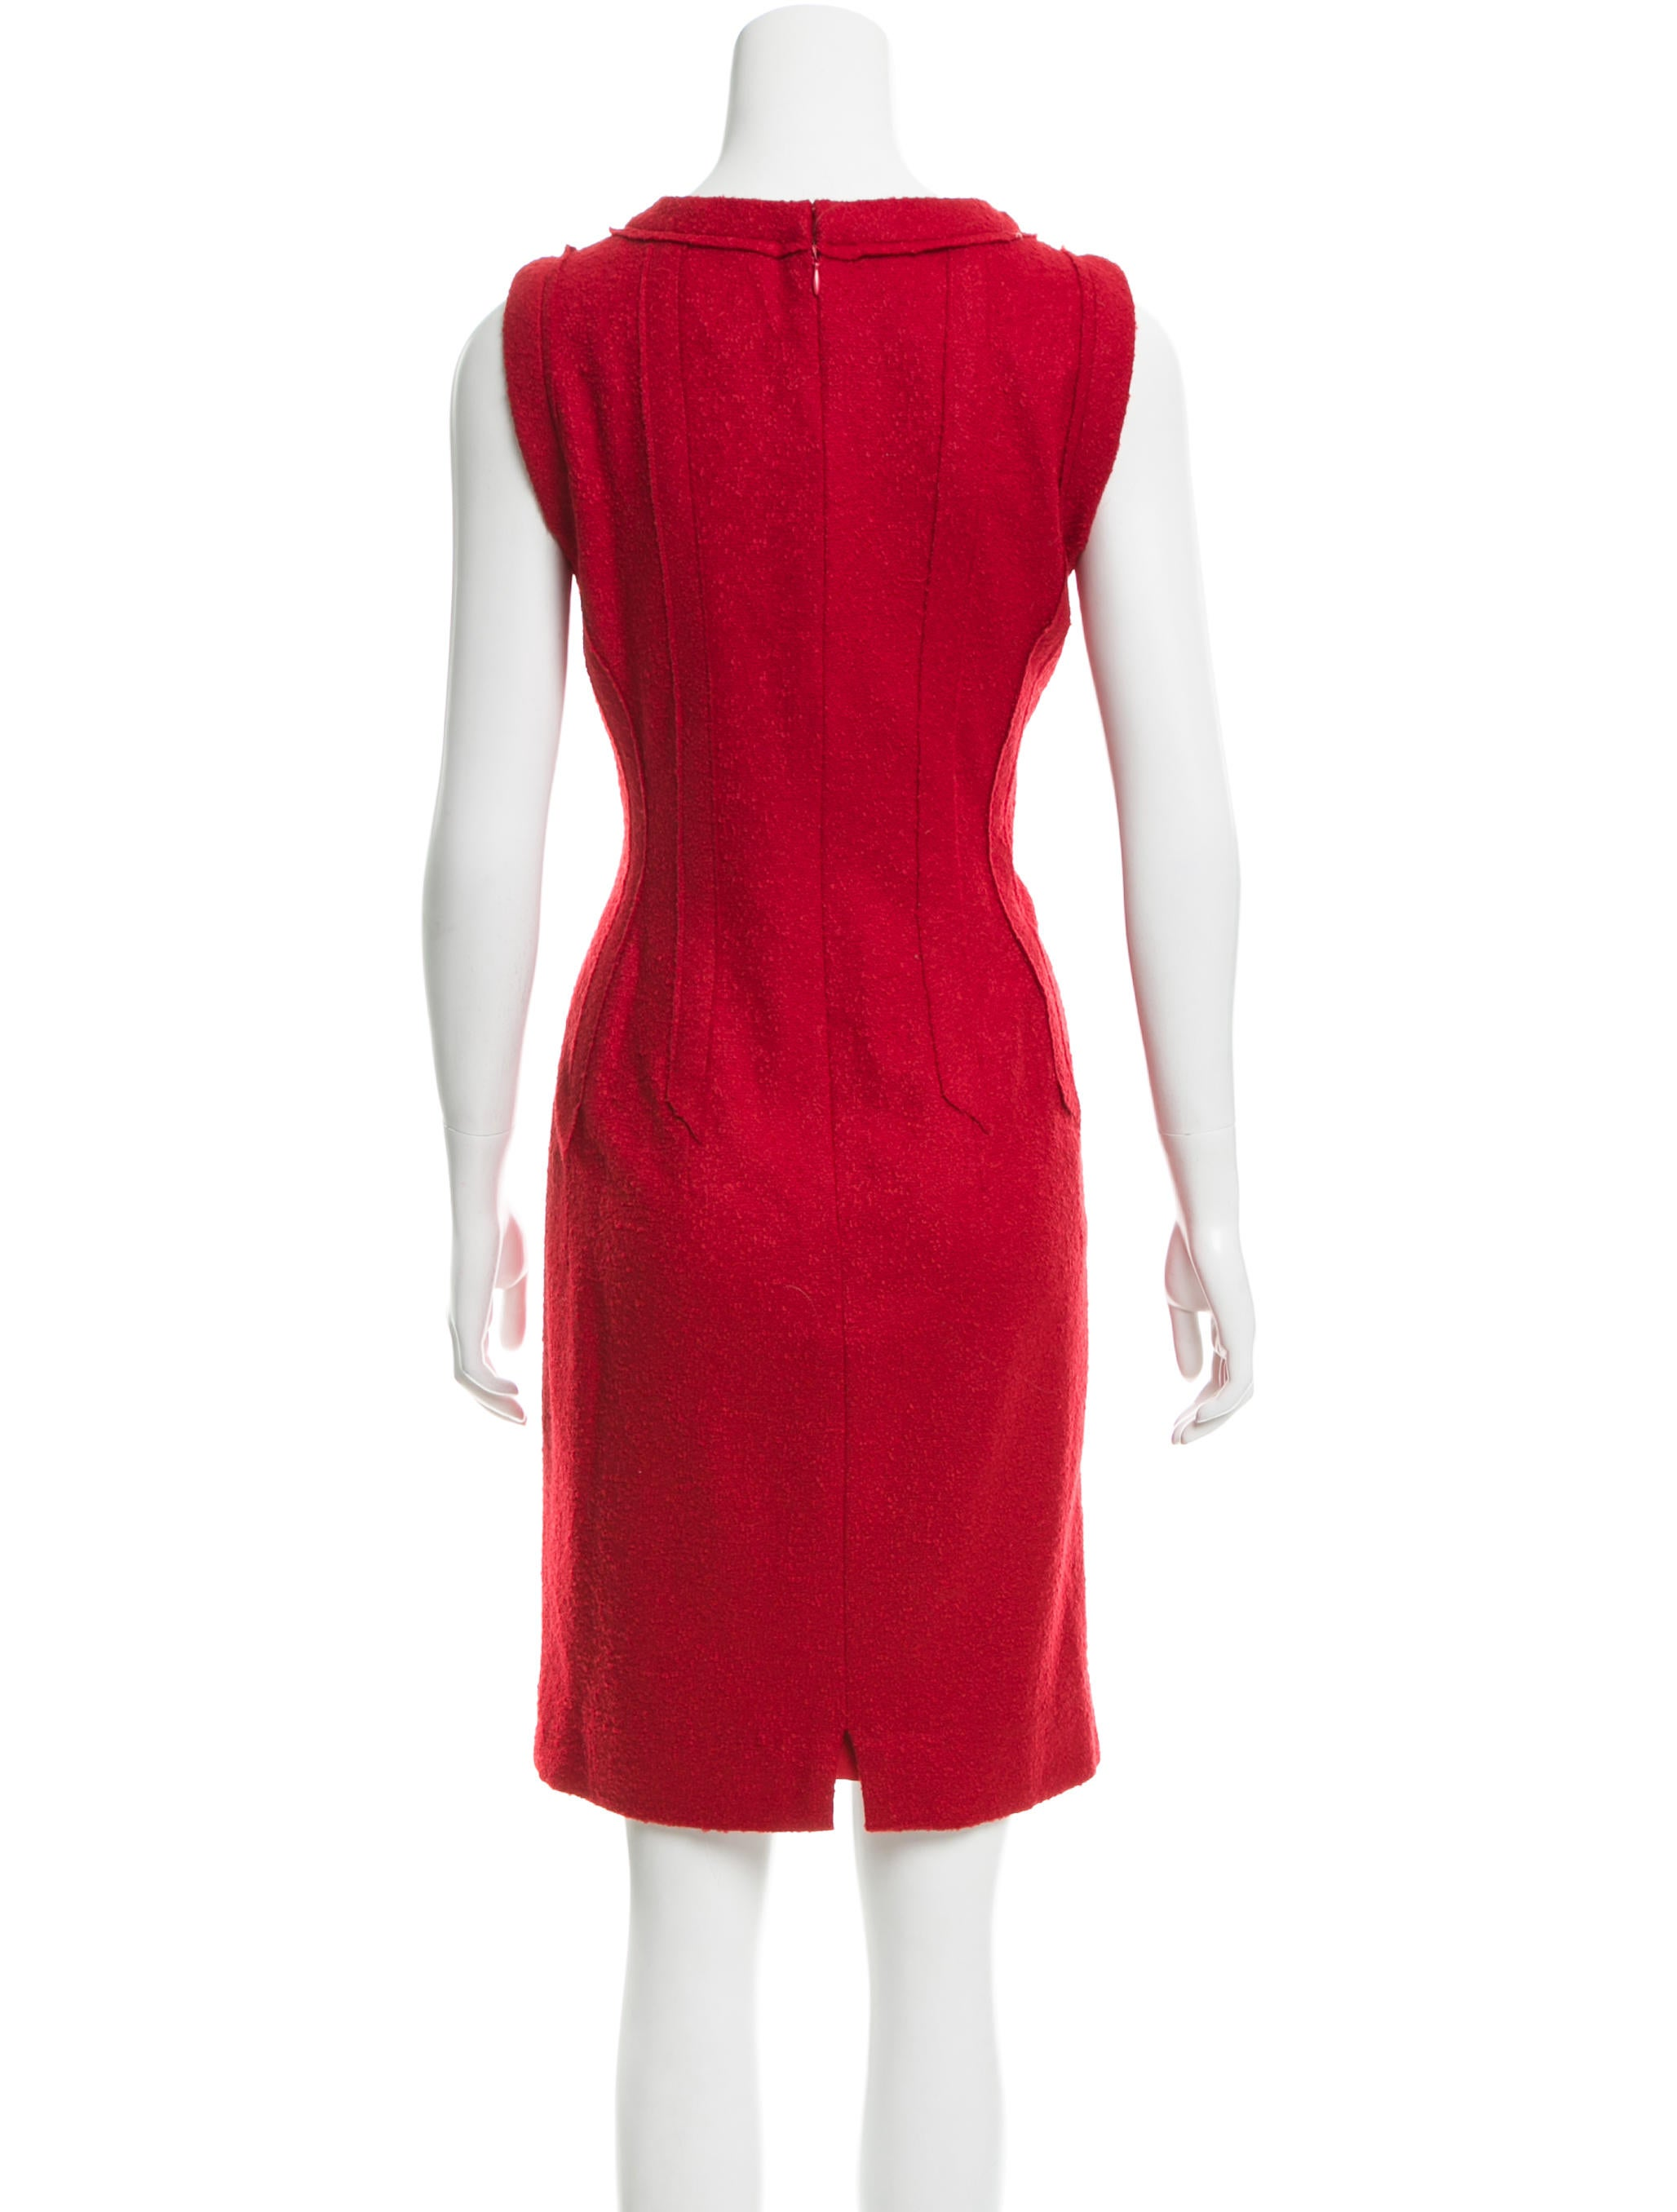 Oscar de la Renta Wool Blend Dress - Clothing